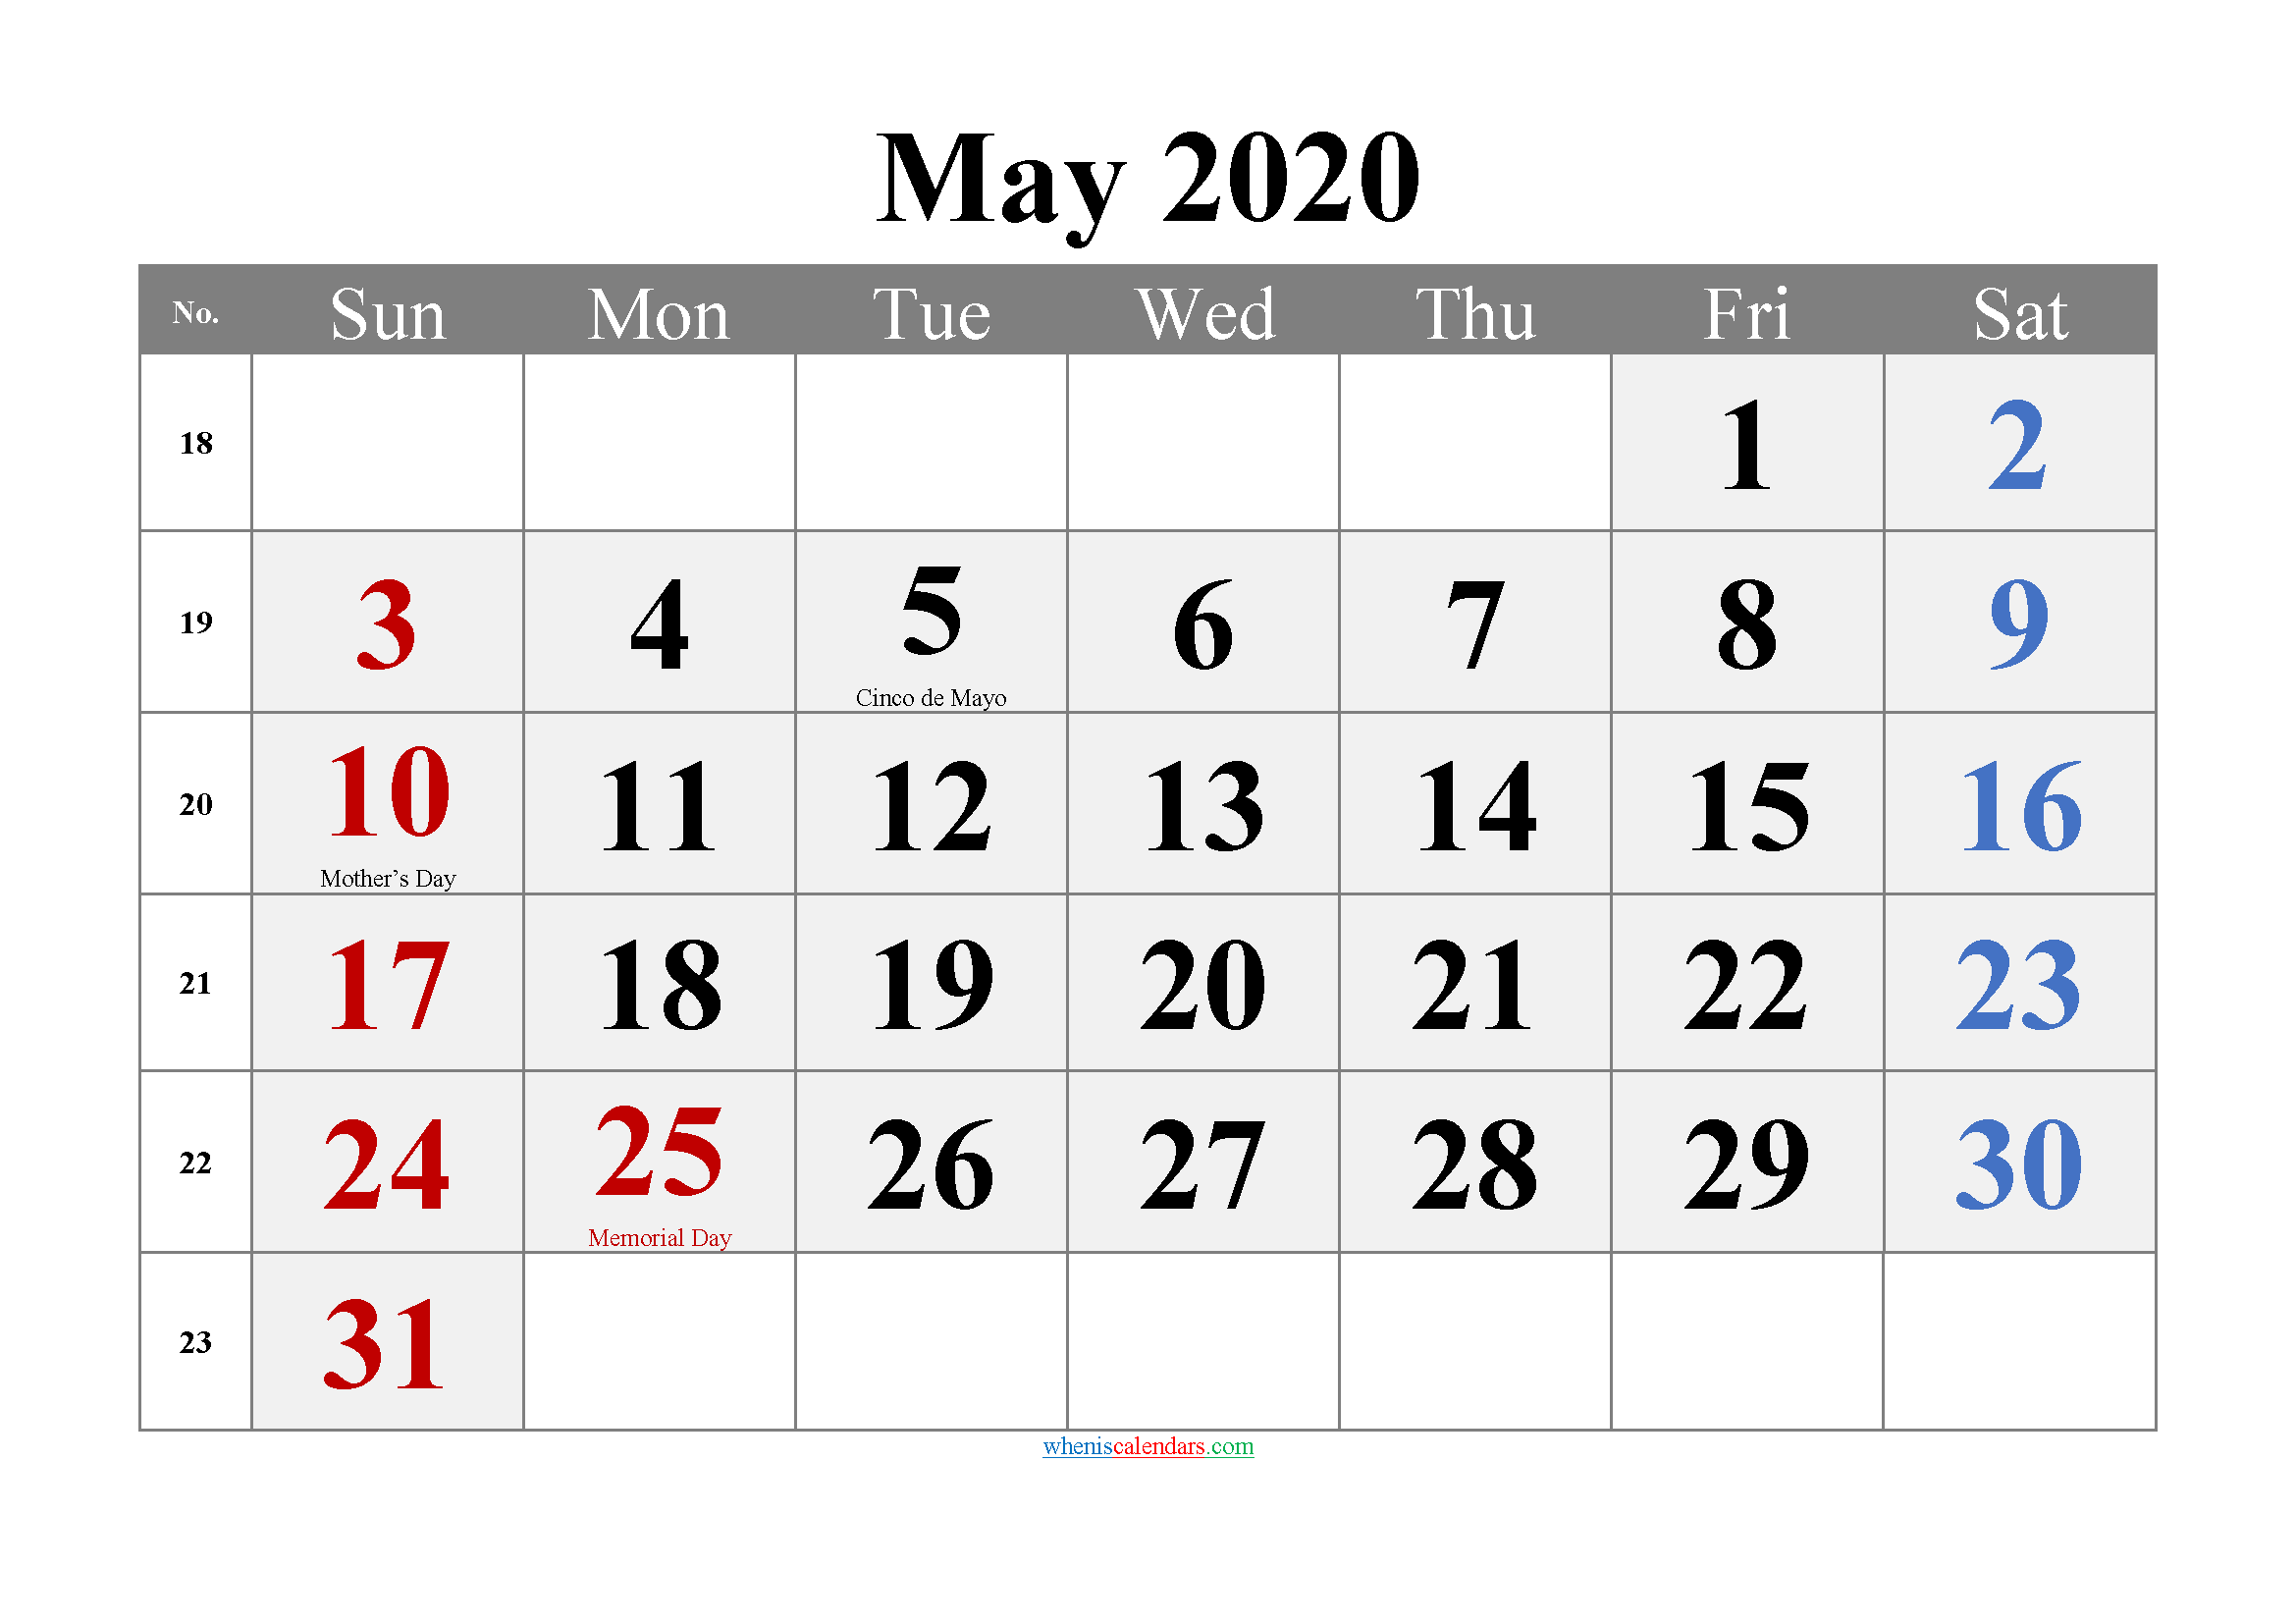 May 2020 Printable Calendar with Holidays